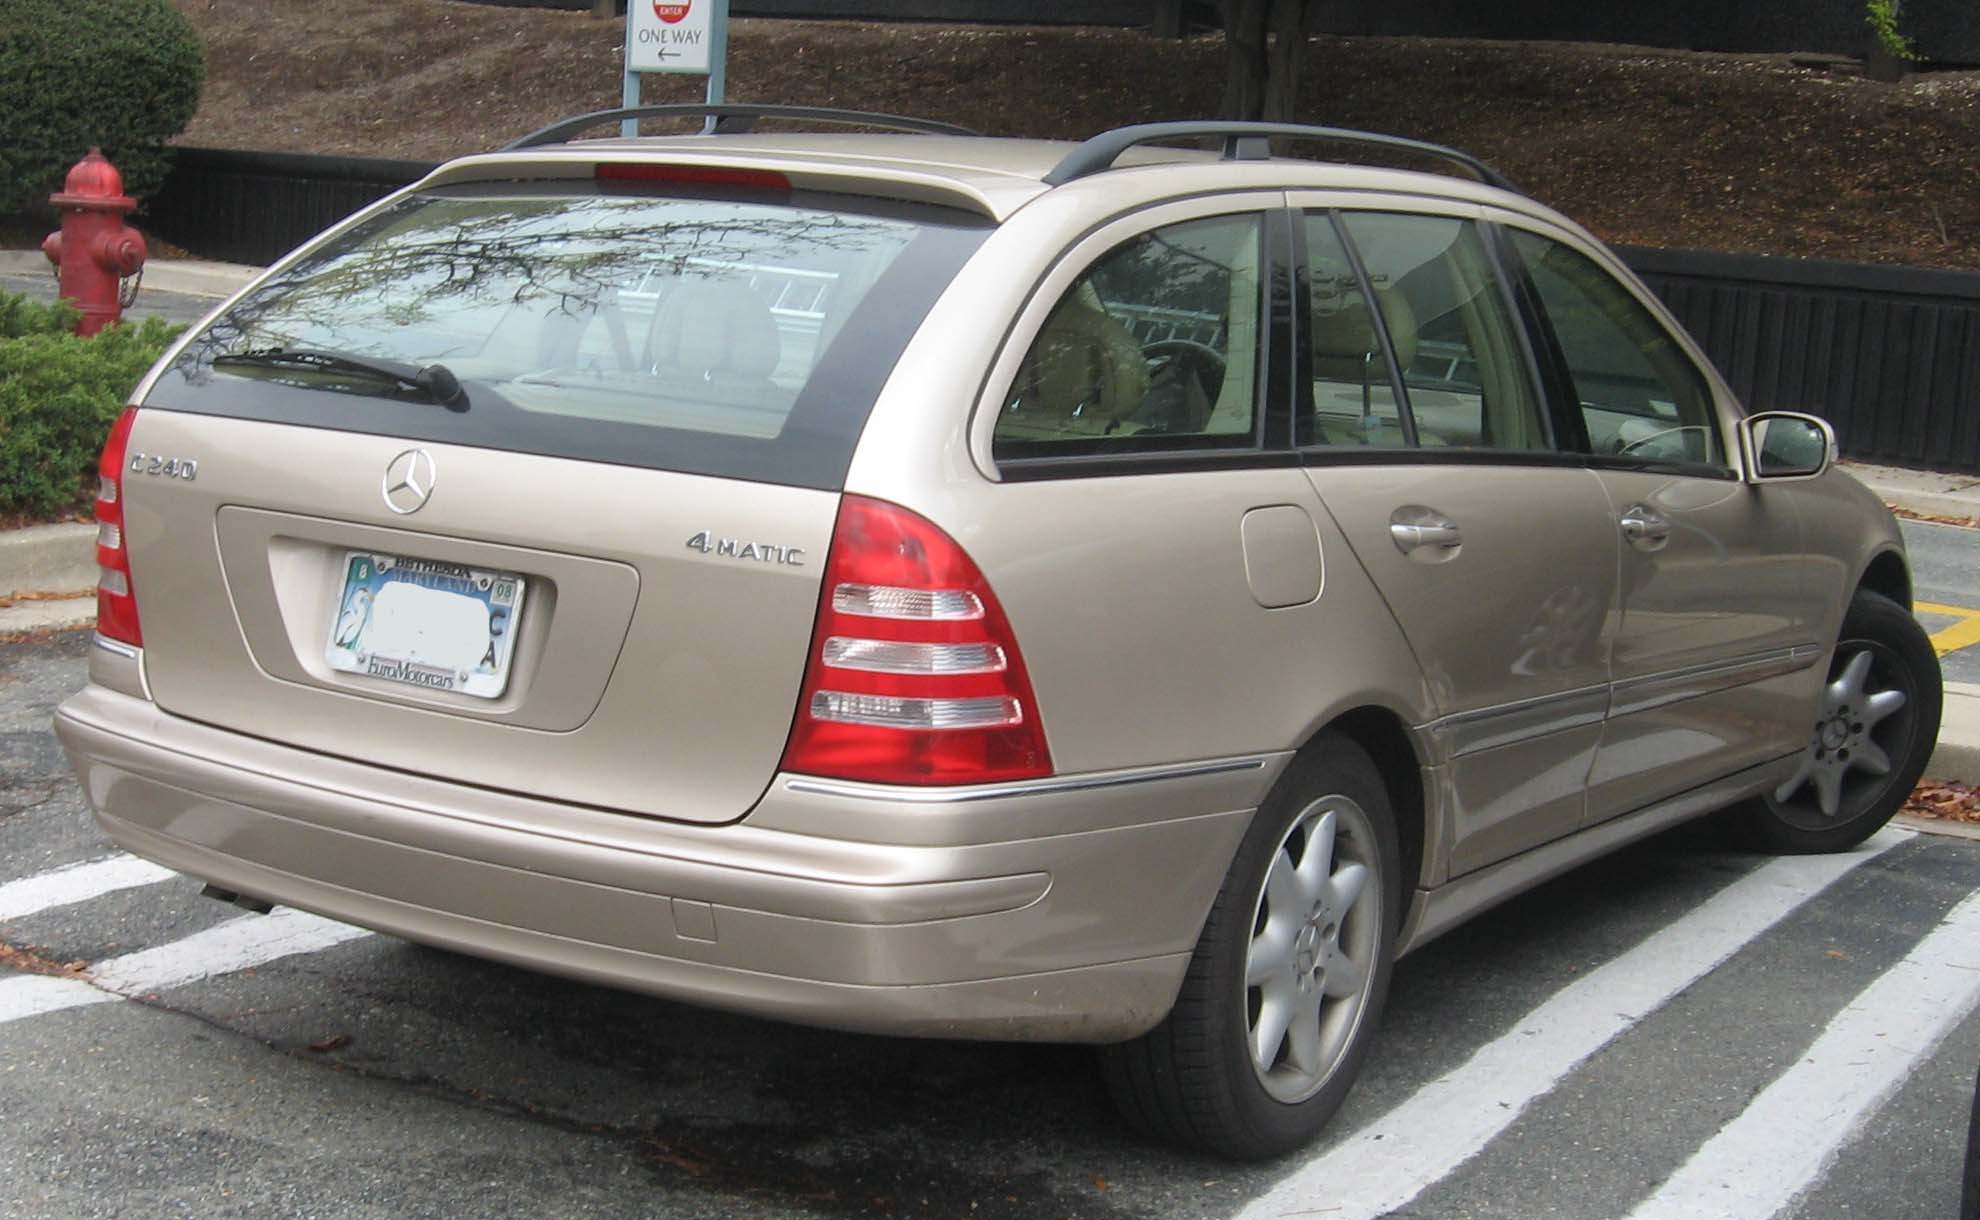 Mercedes-Benz C-klasse I (W202) Restyling 1997 - 2000 Station wagon 5 door #1